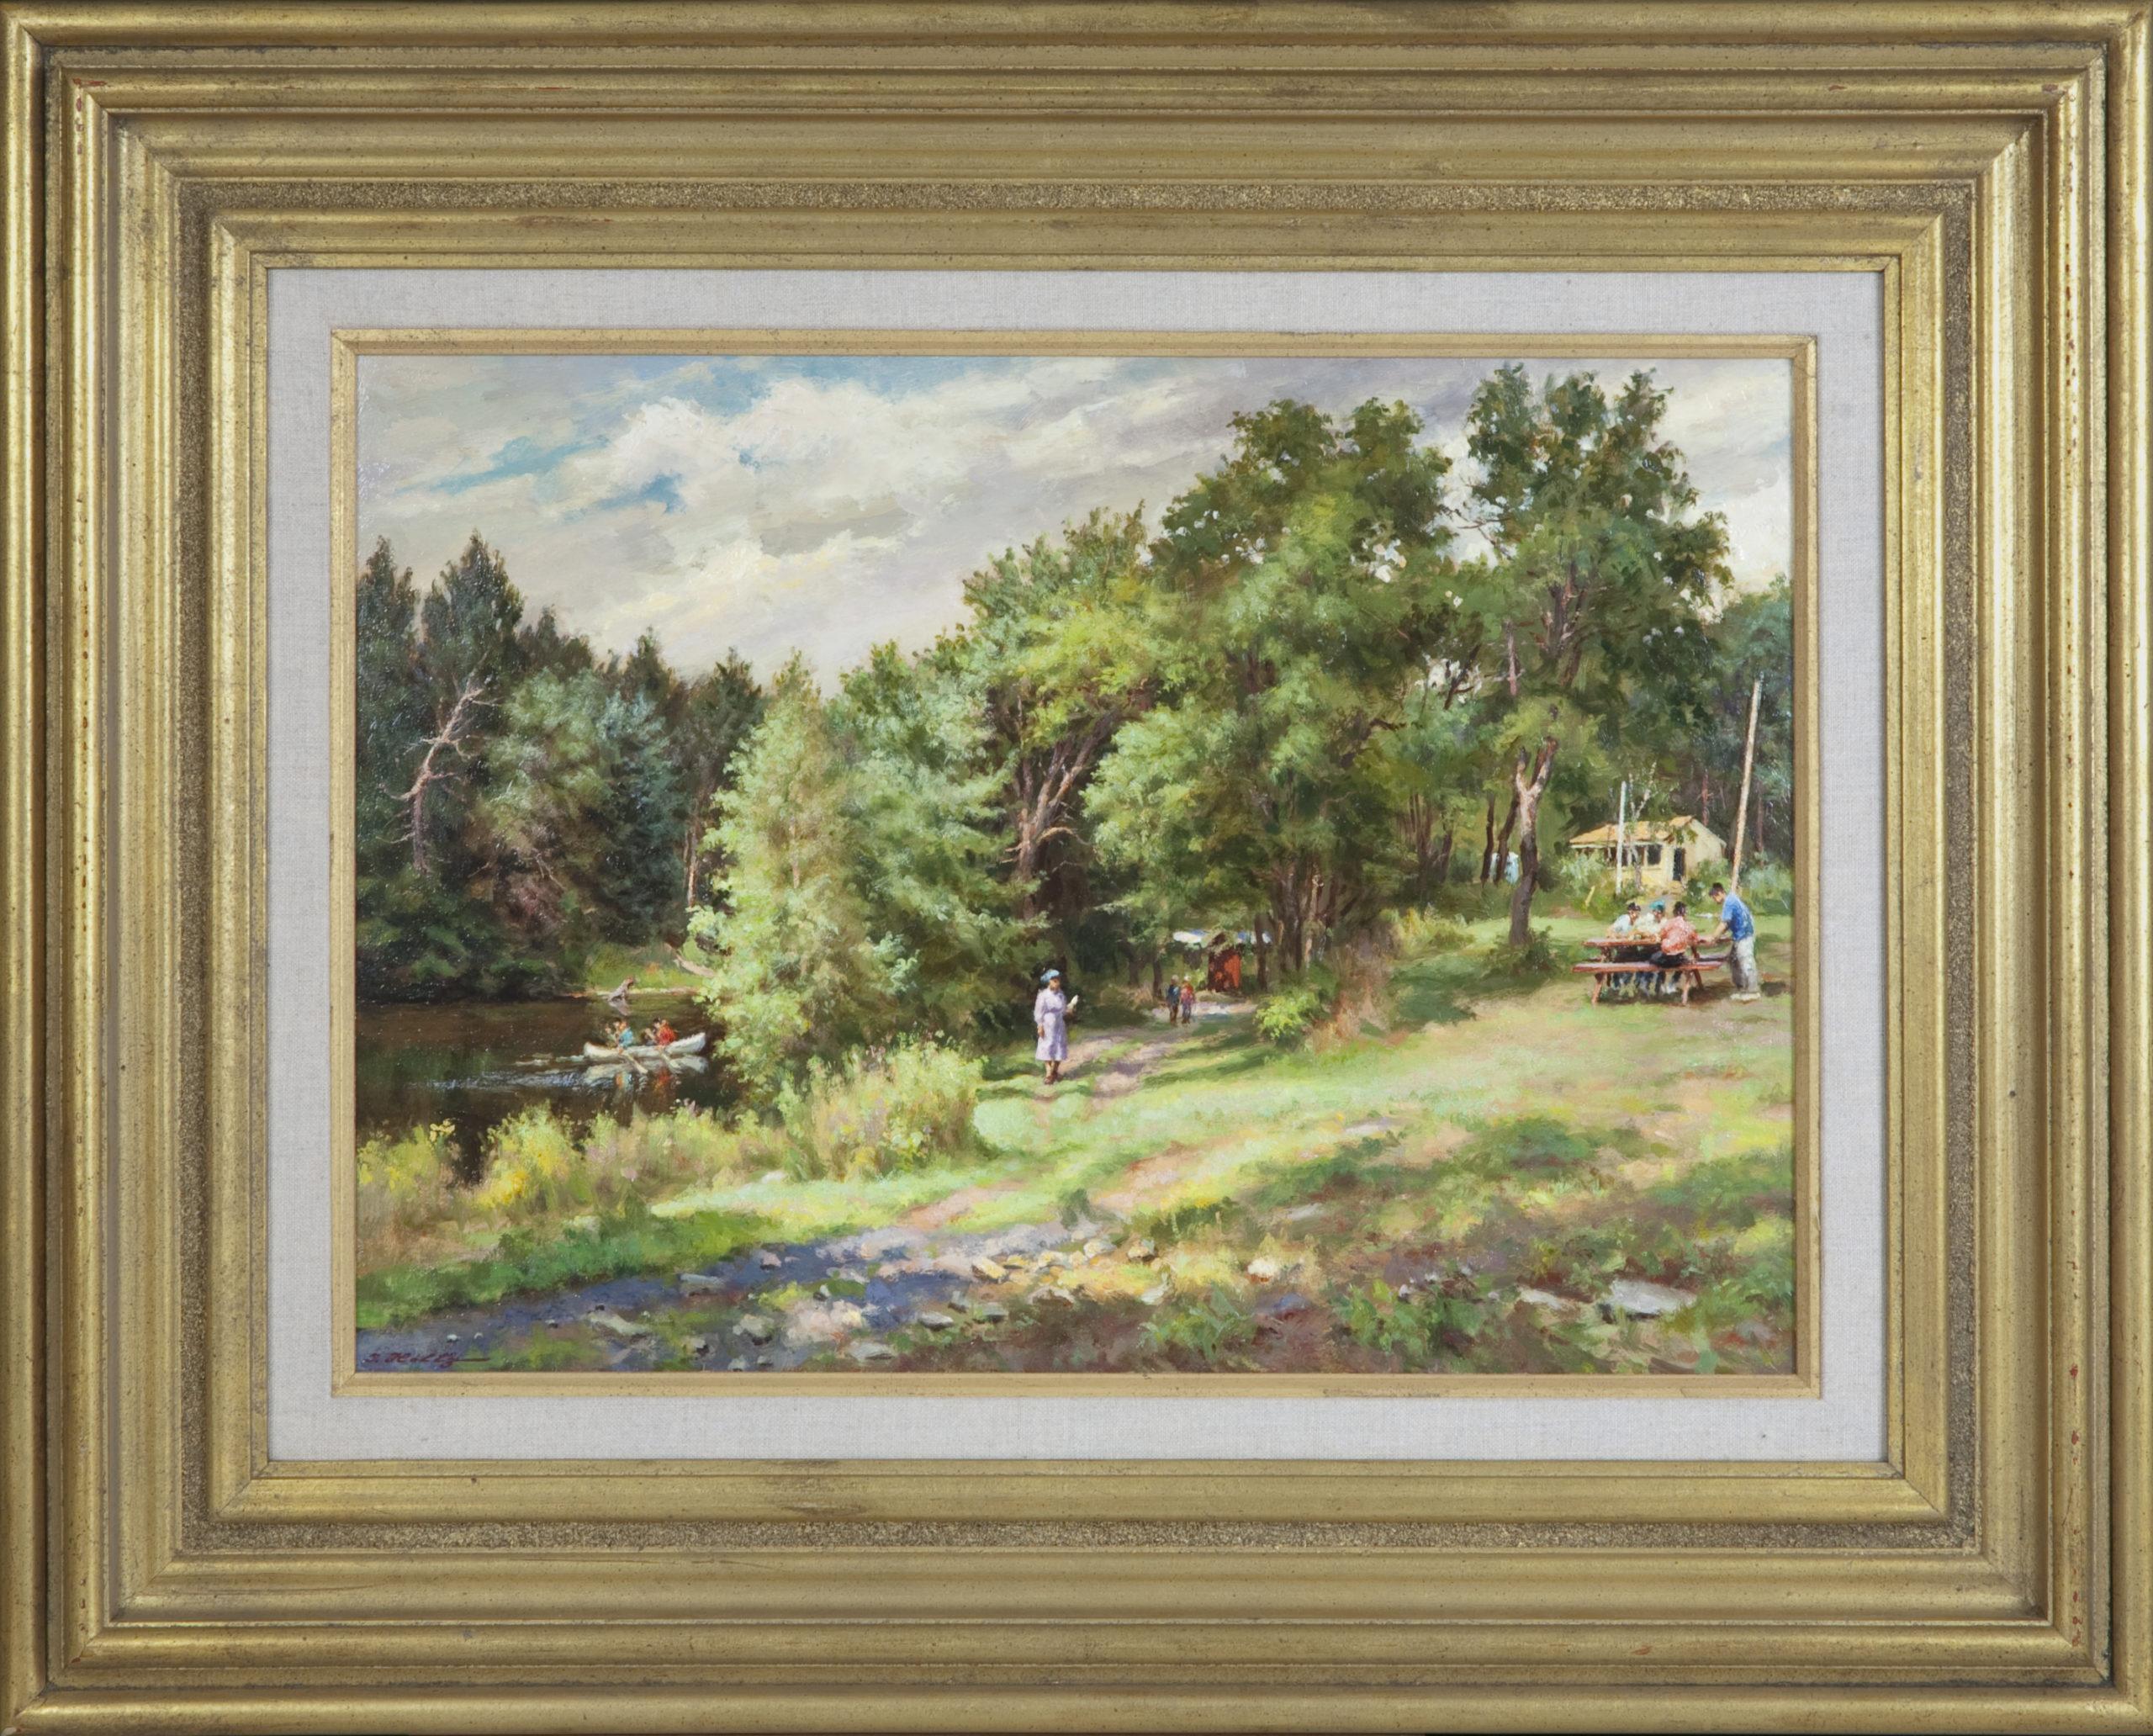 104 Summer in the Poconos 1988 - Oil on Masonite - 20 x 14 - Frame: 29.75 x 23.75 x 2